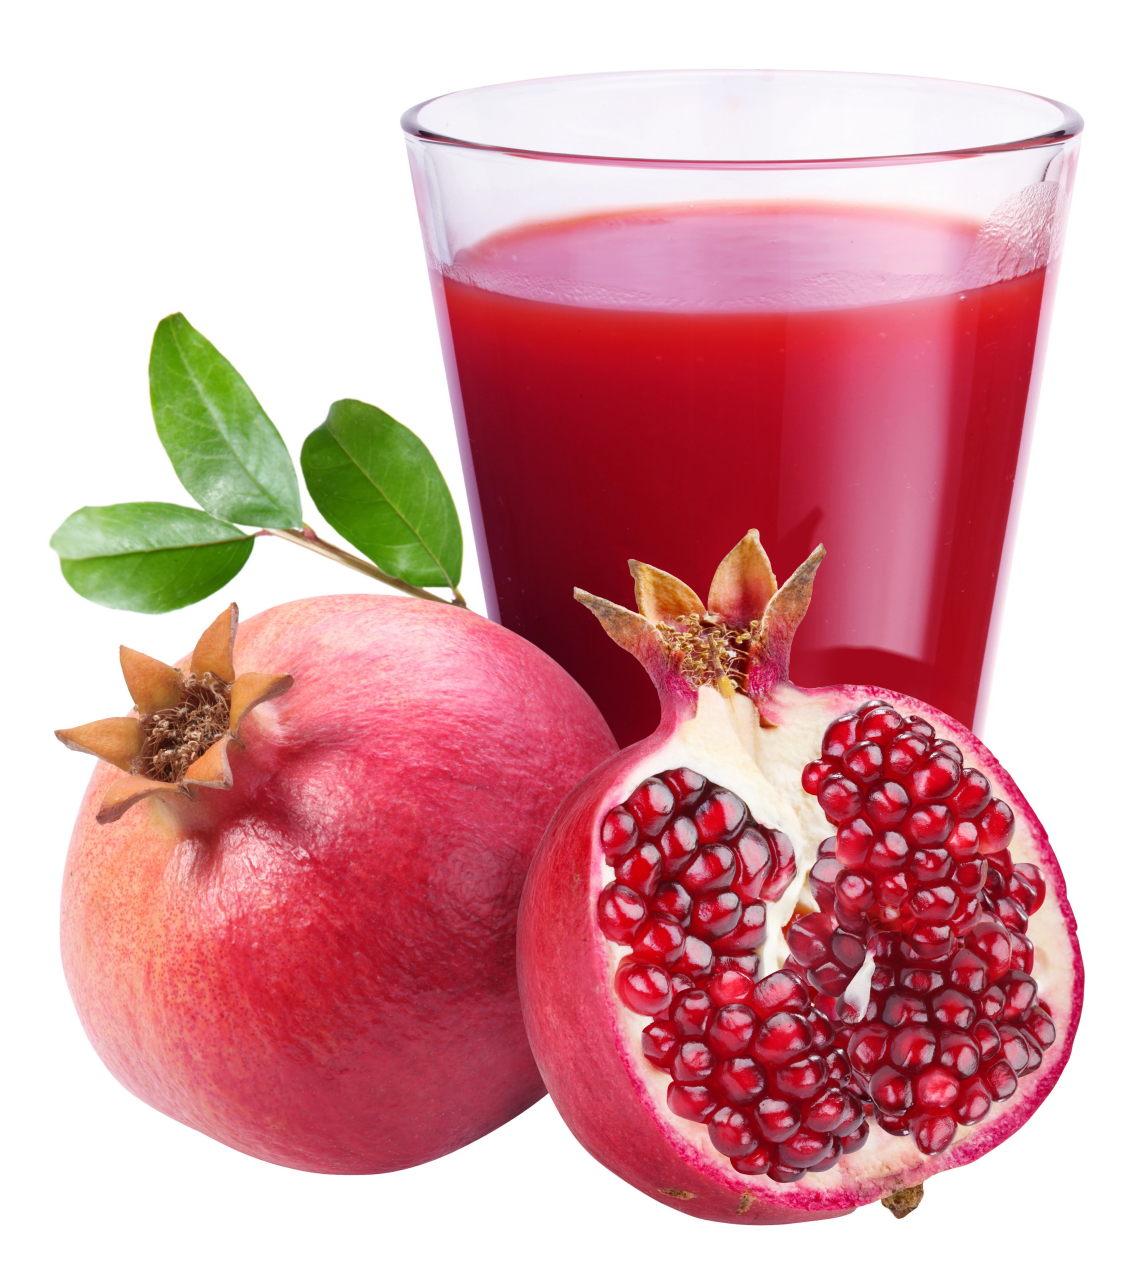 http://www.fotokanal.com/images/22/pomegranate-juice.jpg